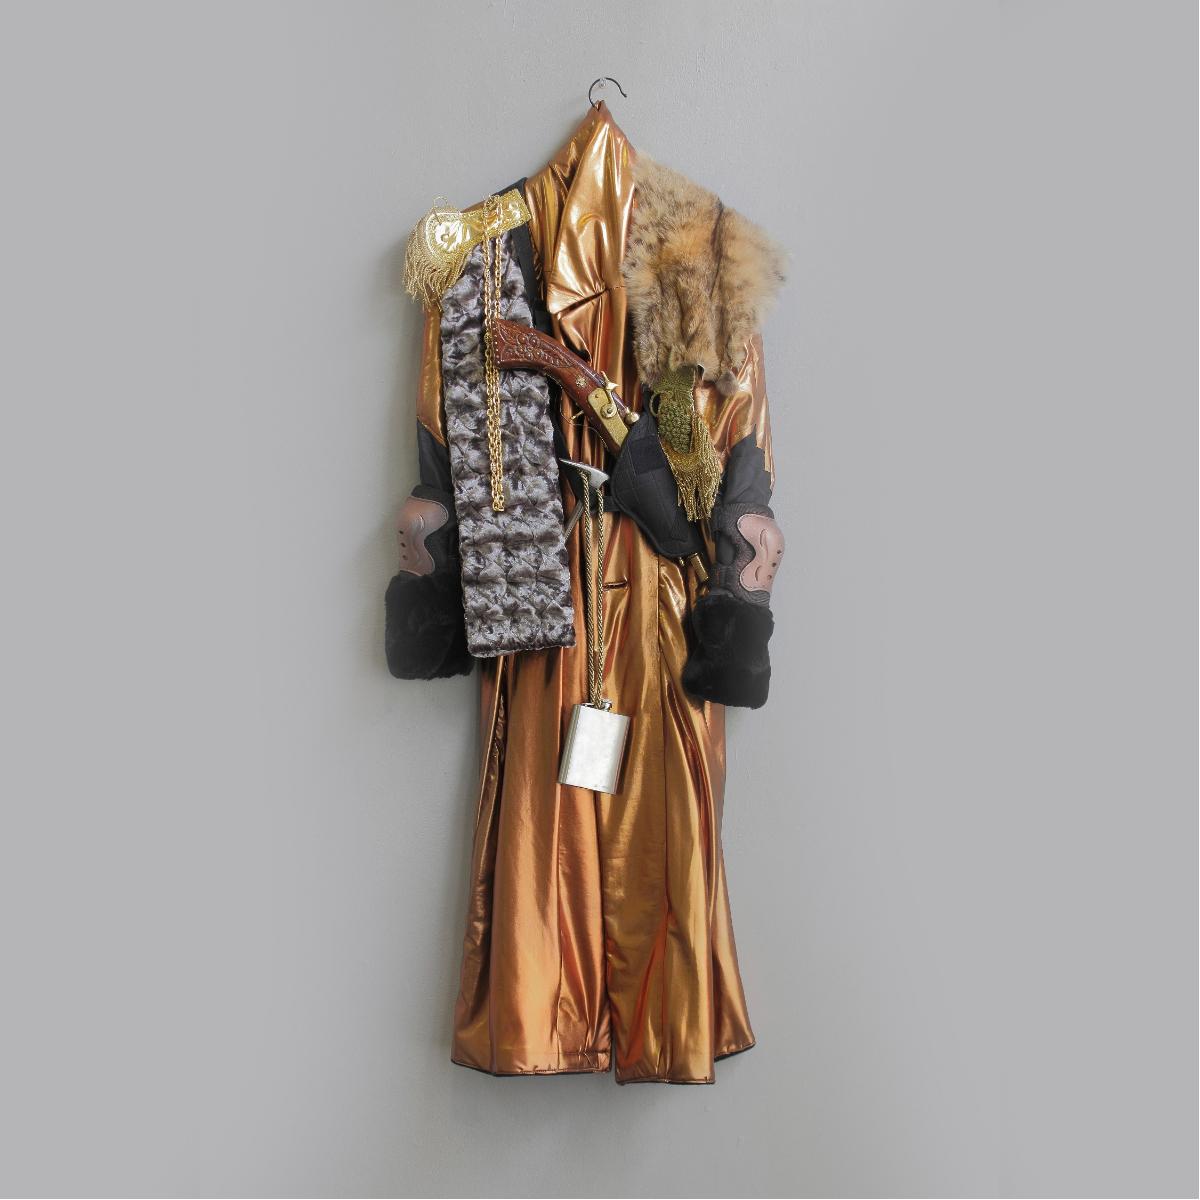 PREPPER COAT, 2016, wall sculpture &  performance costume  @SOME DEMONSTRATIONS by Charlie Stein  @MANIFESTA, 2016, Zurich